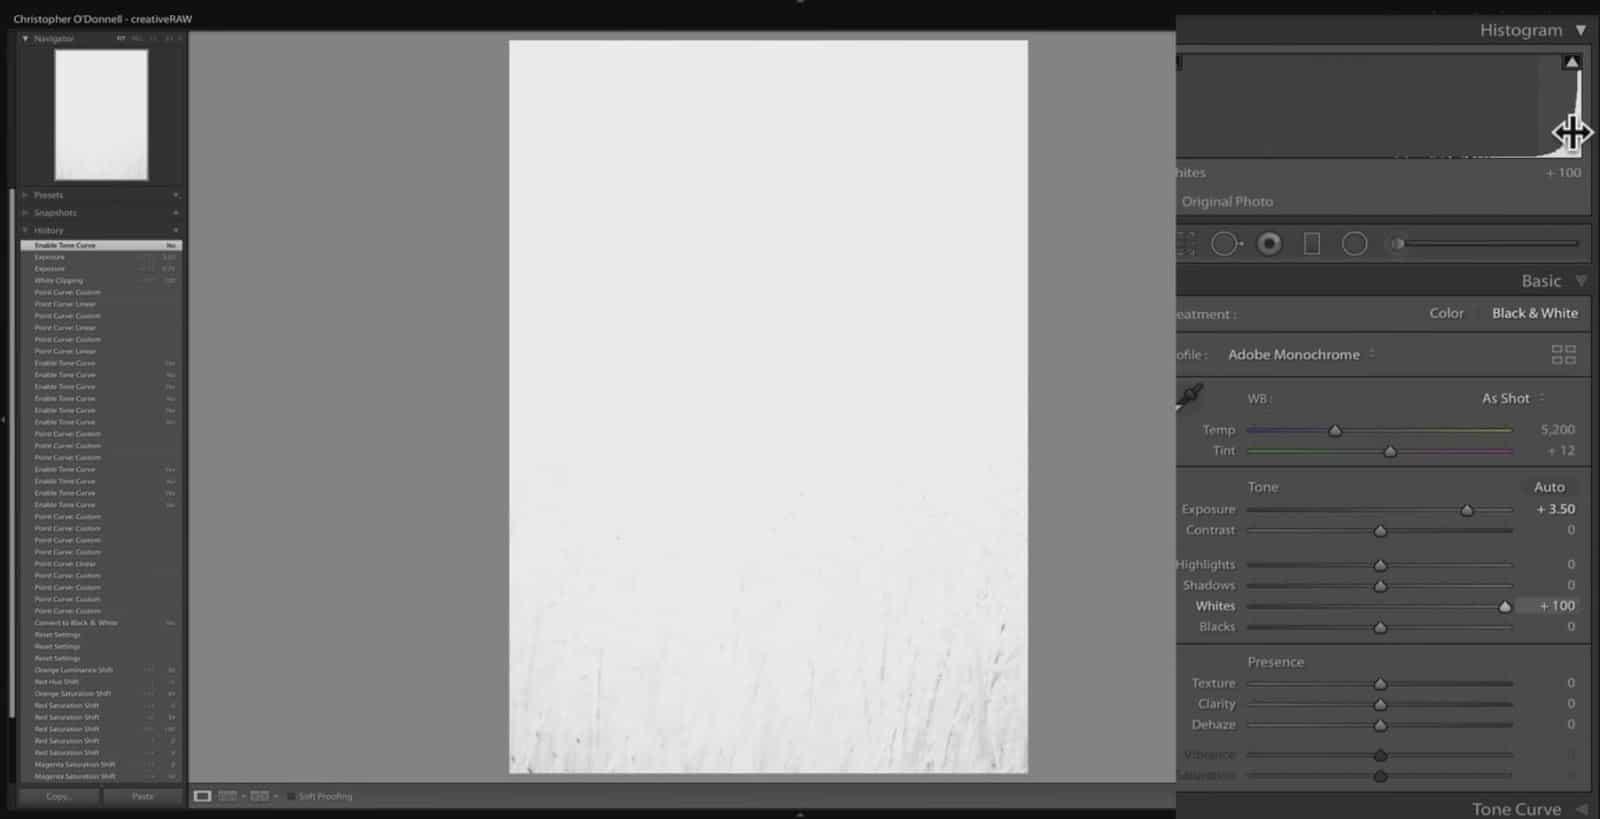 Tonal Limits - Lightroom and Photoshop